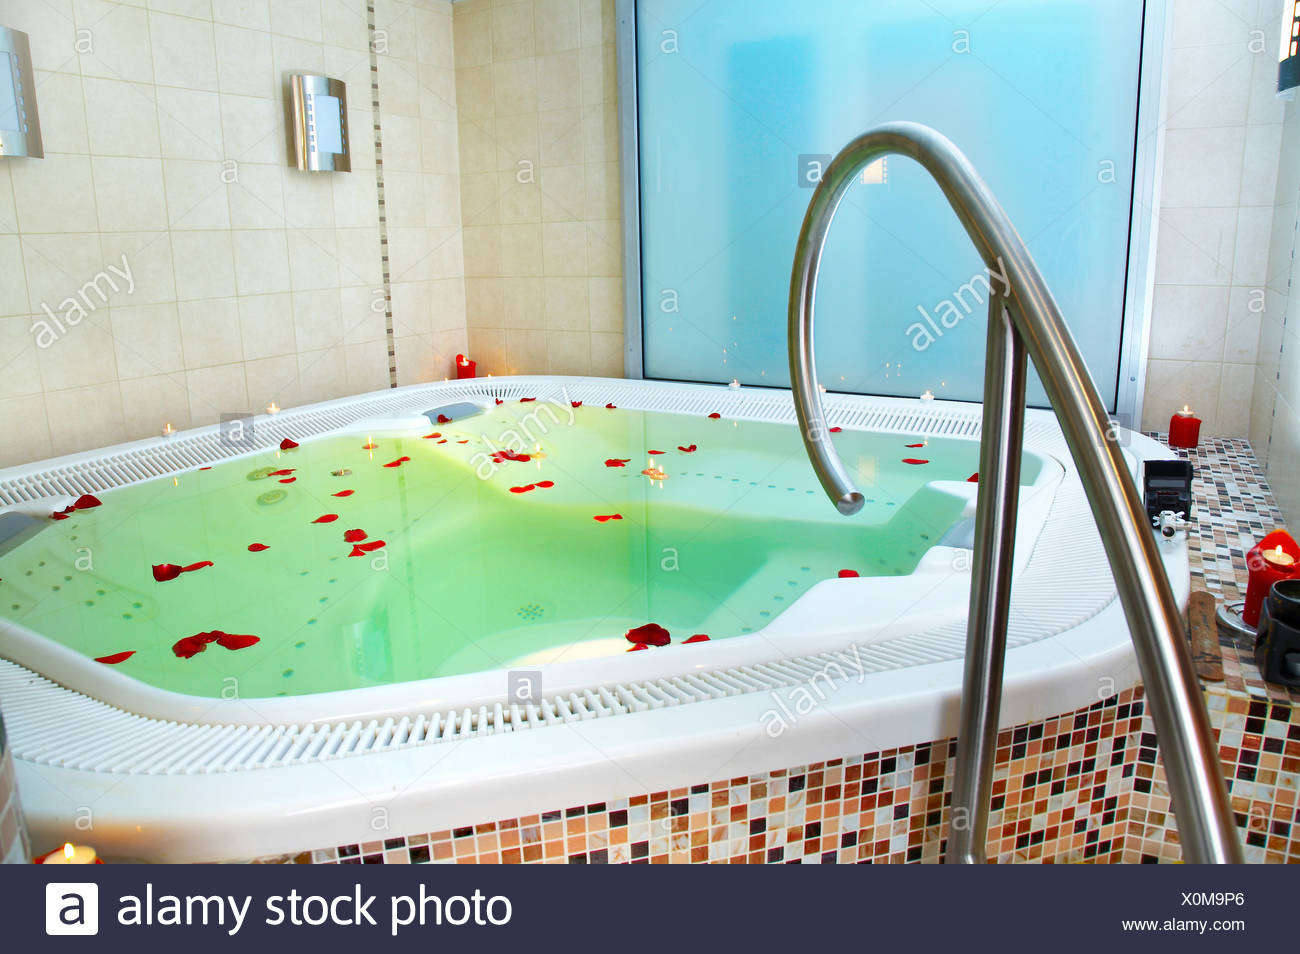 Public Hot Tub Stock Photos & Public Hot Tub Stock Images - Alamy